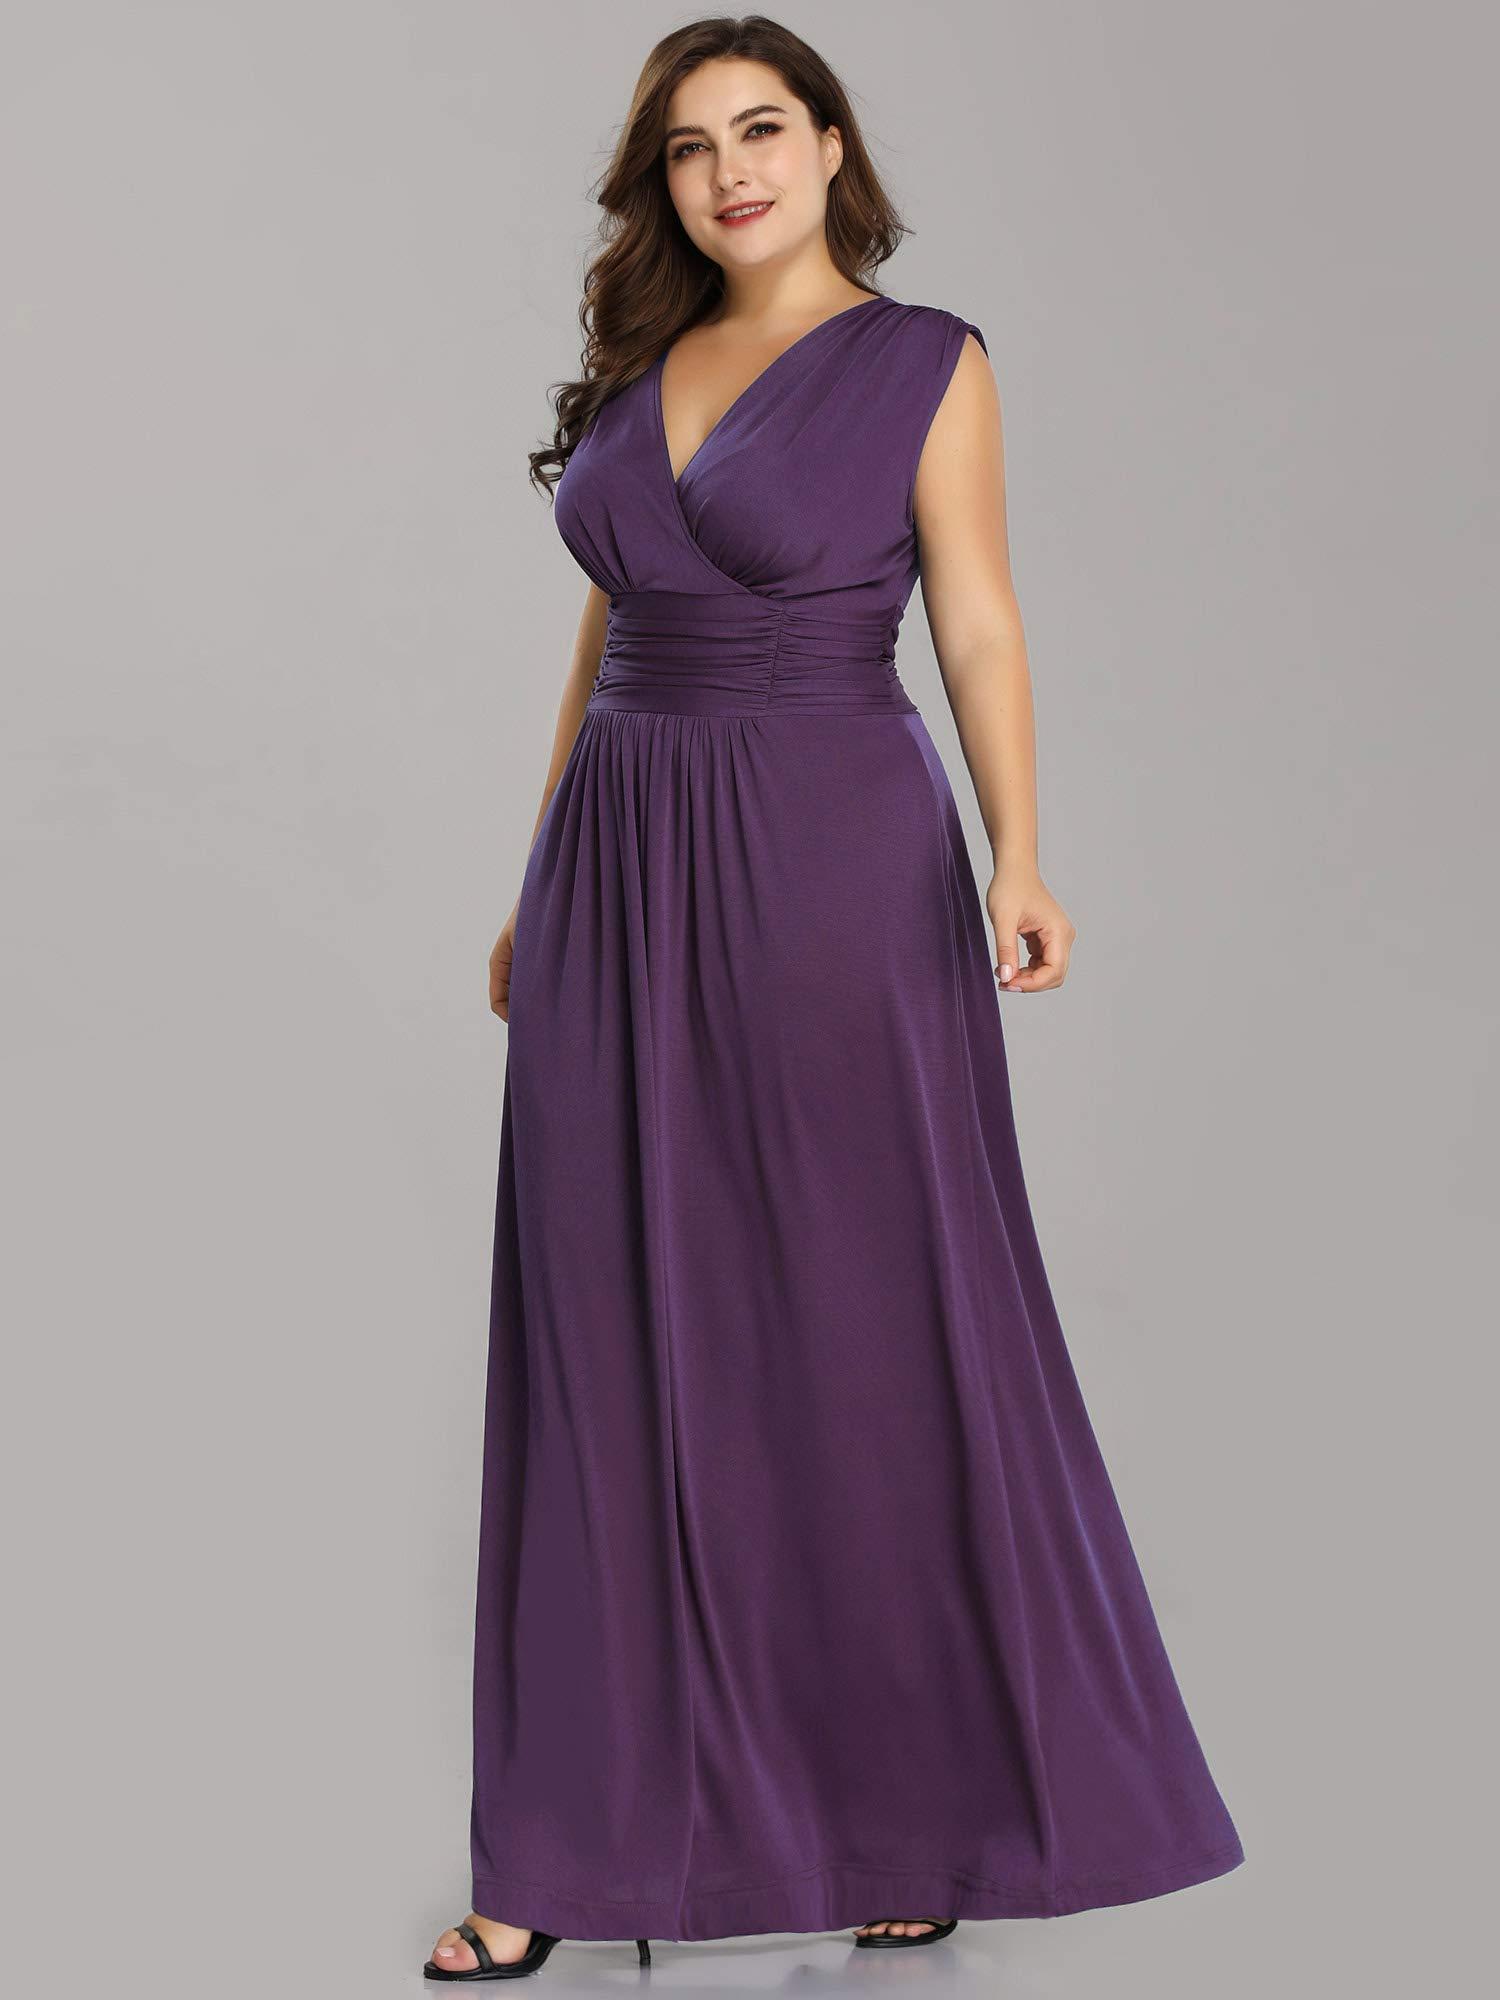 Plus Size Purple Wedding Dress - Ficts